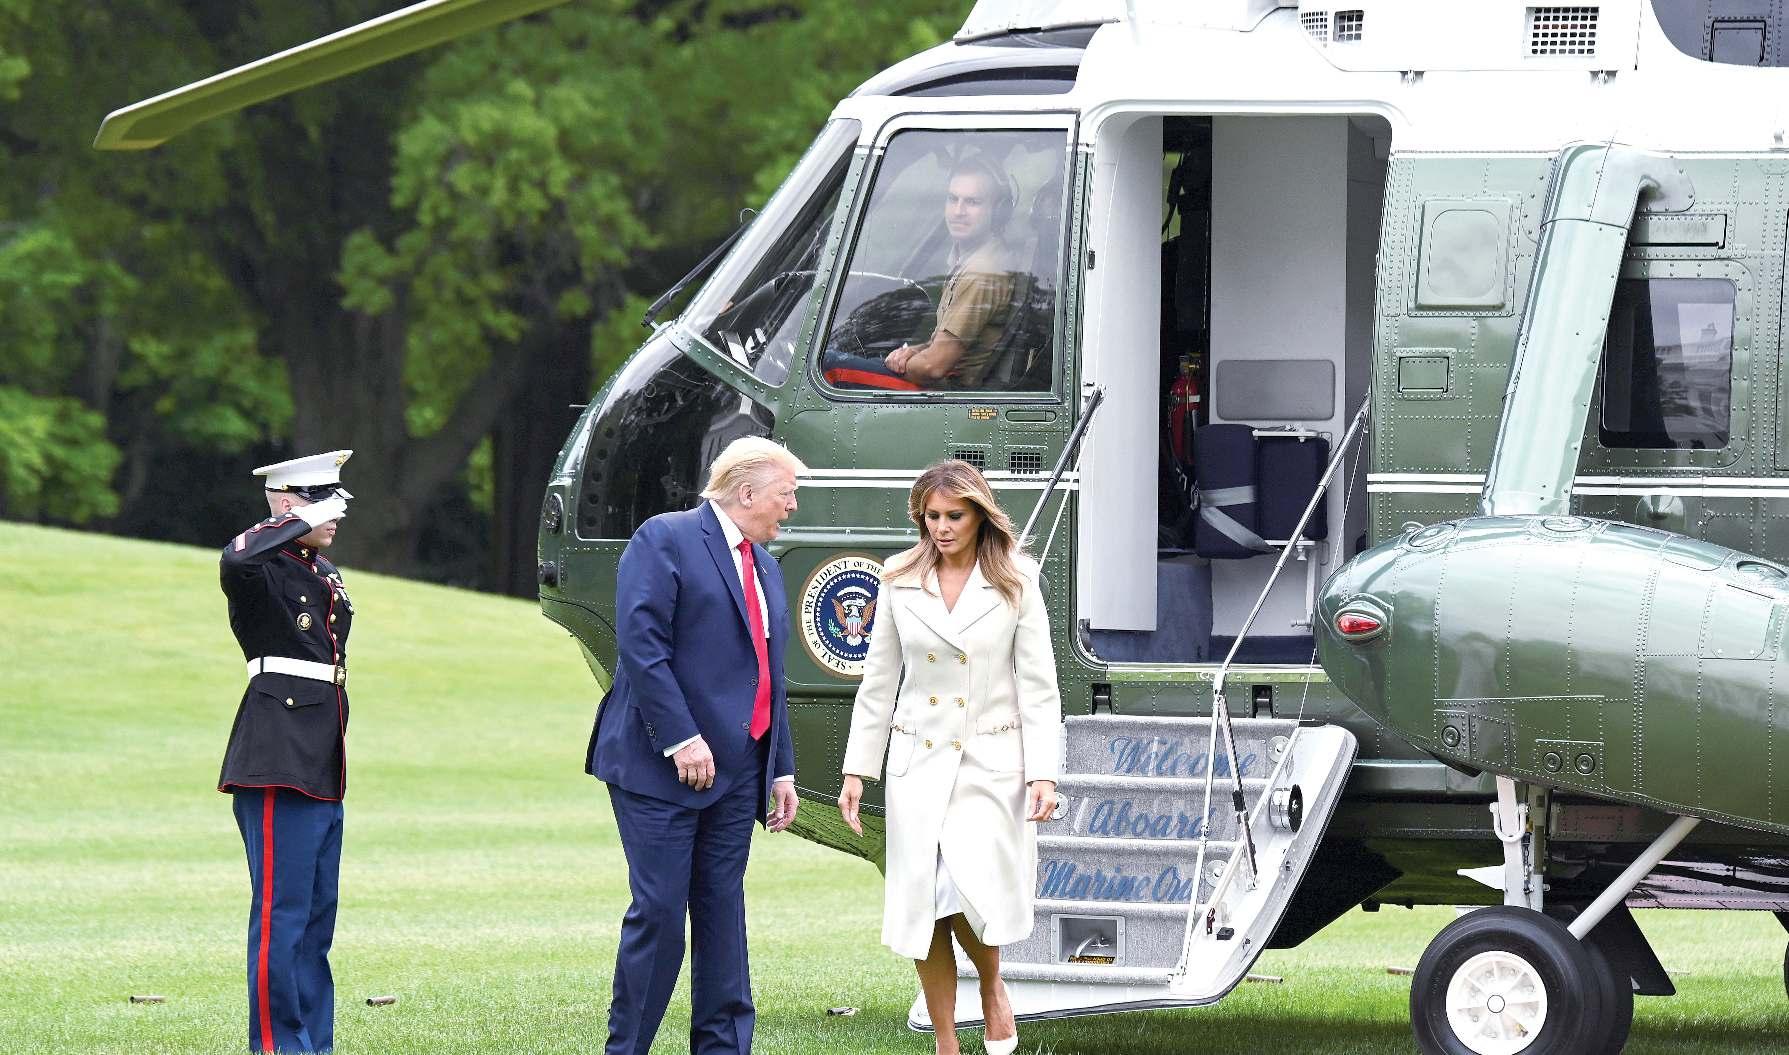 Together We Will Vanquish Virus, Trump Tells Americans